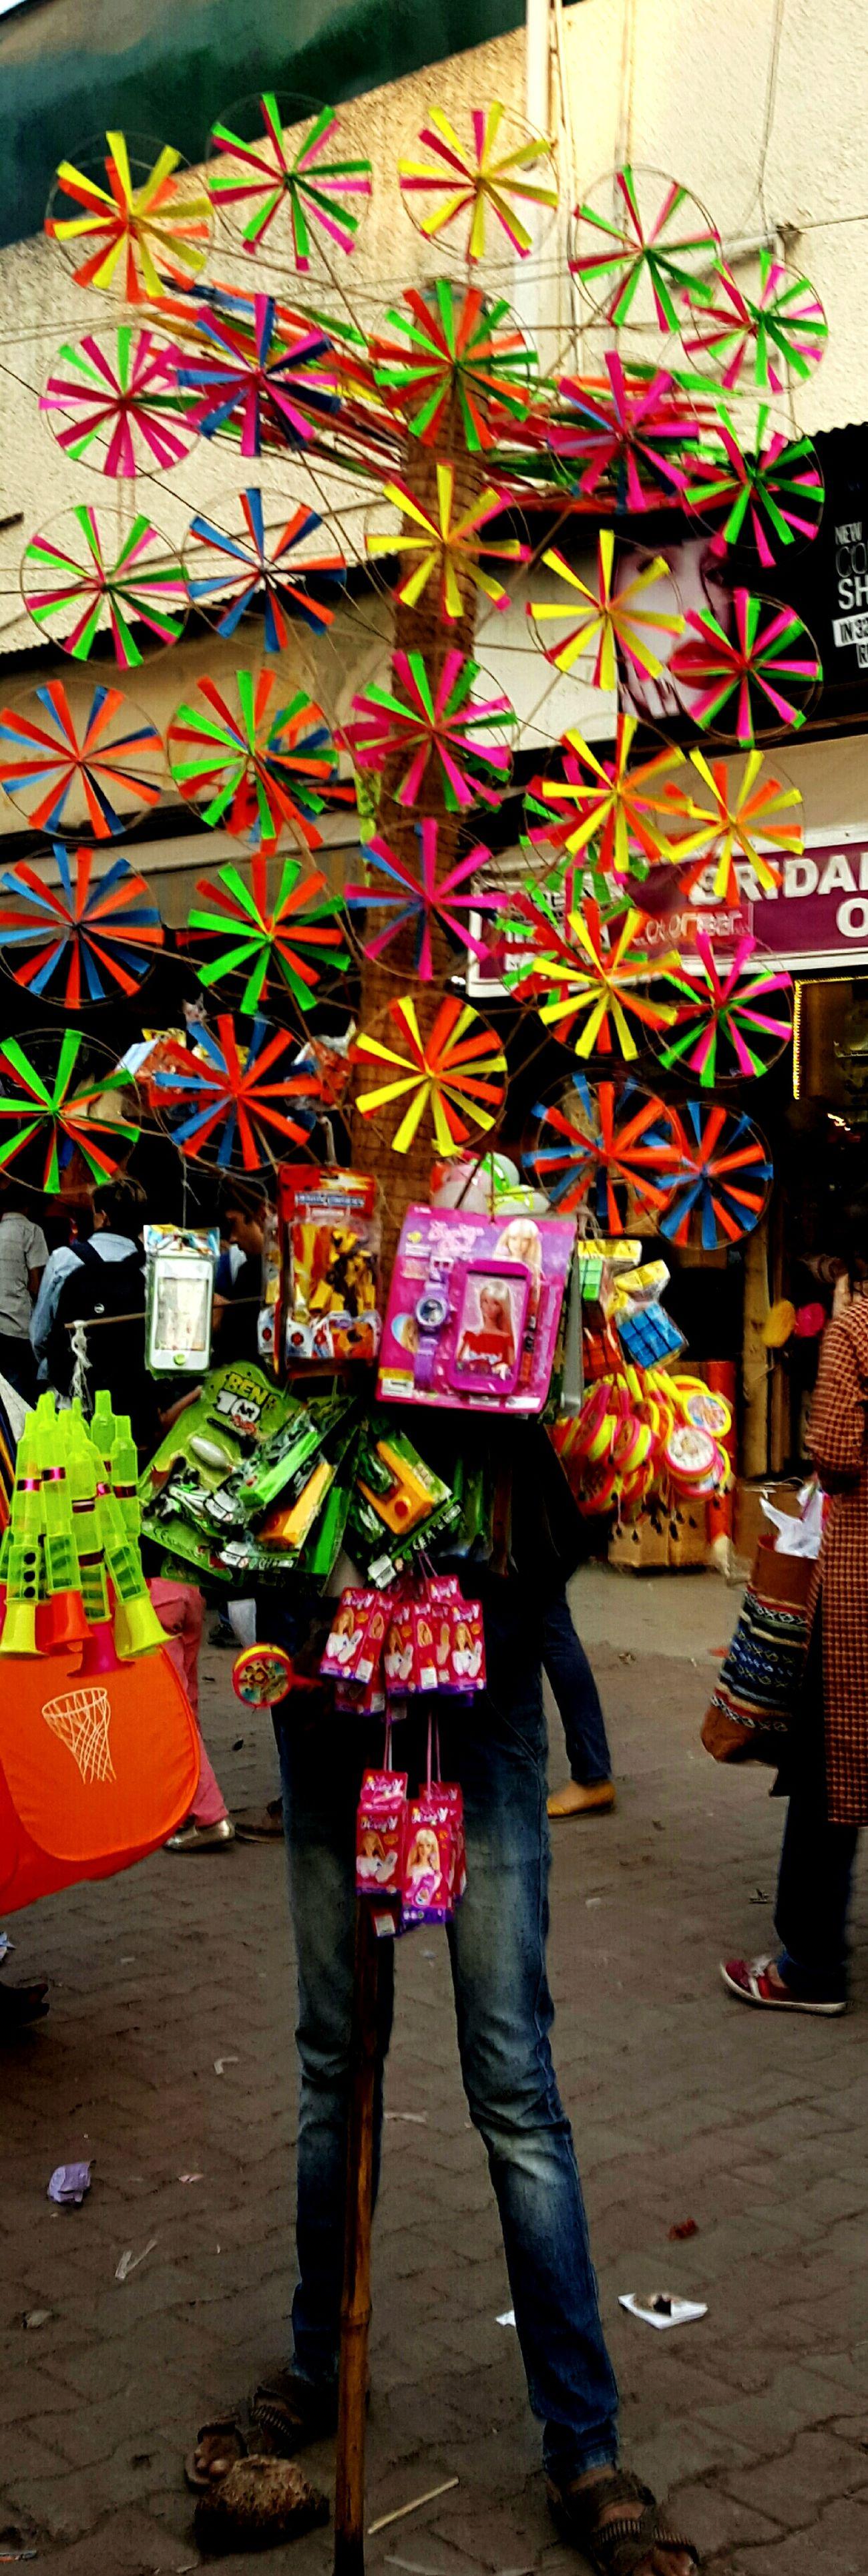 Childhoodmemories Paperwindmill Colorsplash Laugh